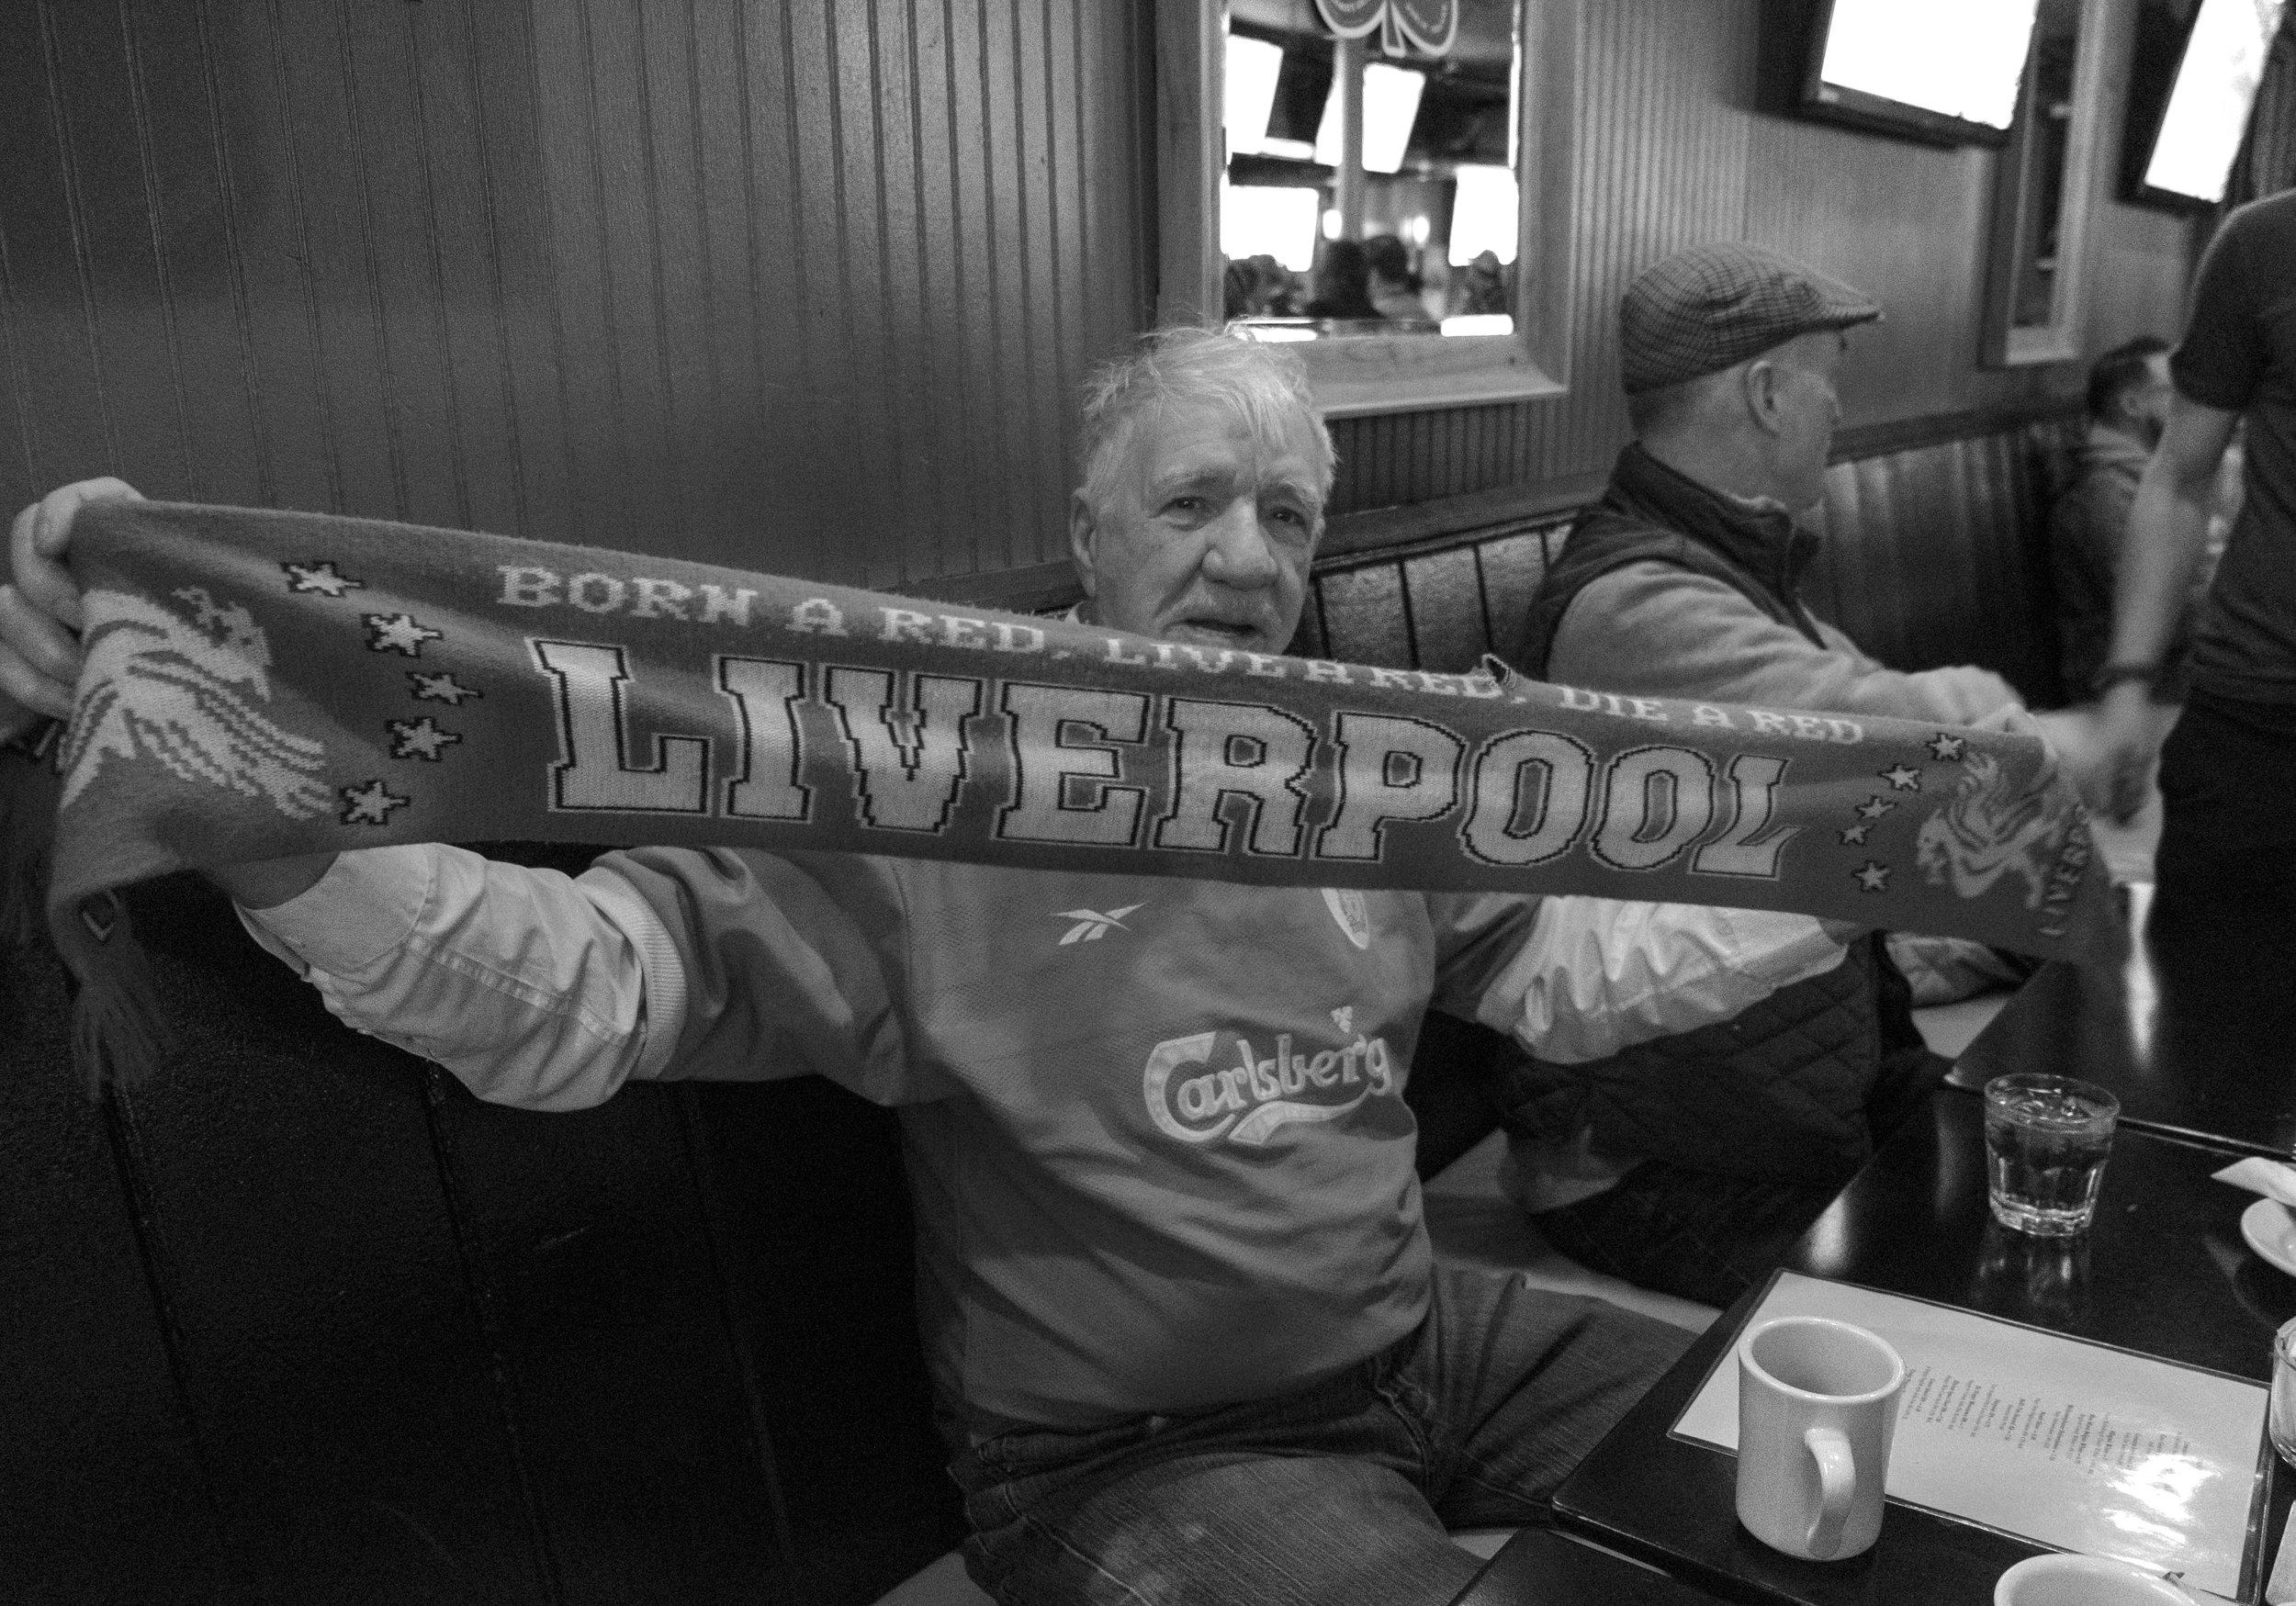 janette-beckman-lfc-supporter-scarf-liverpool.jpg